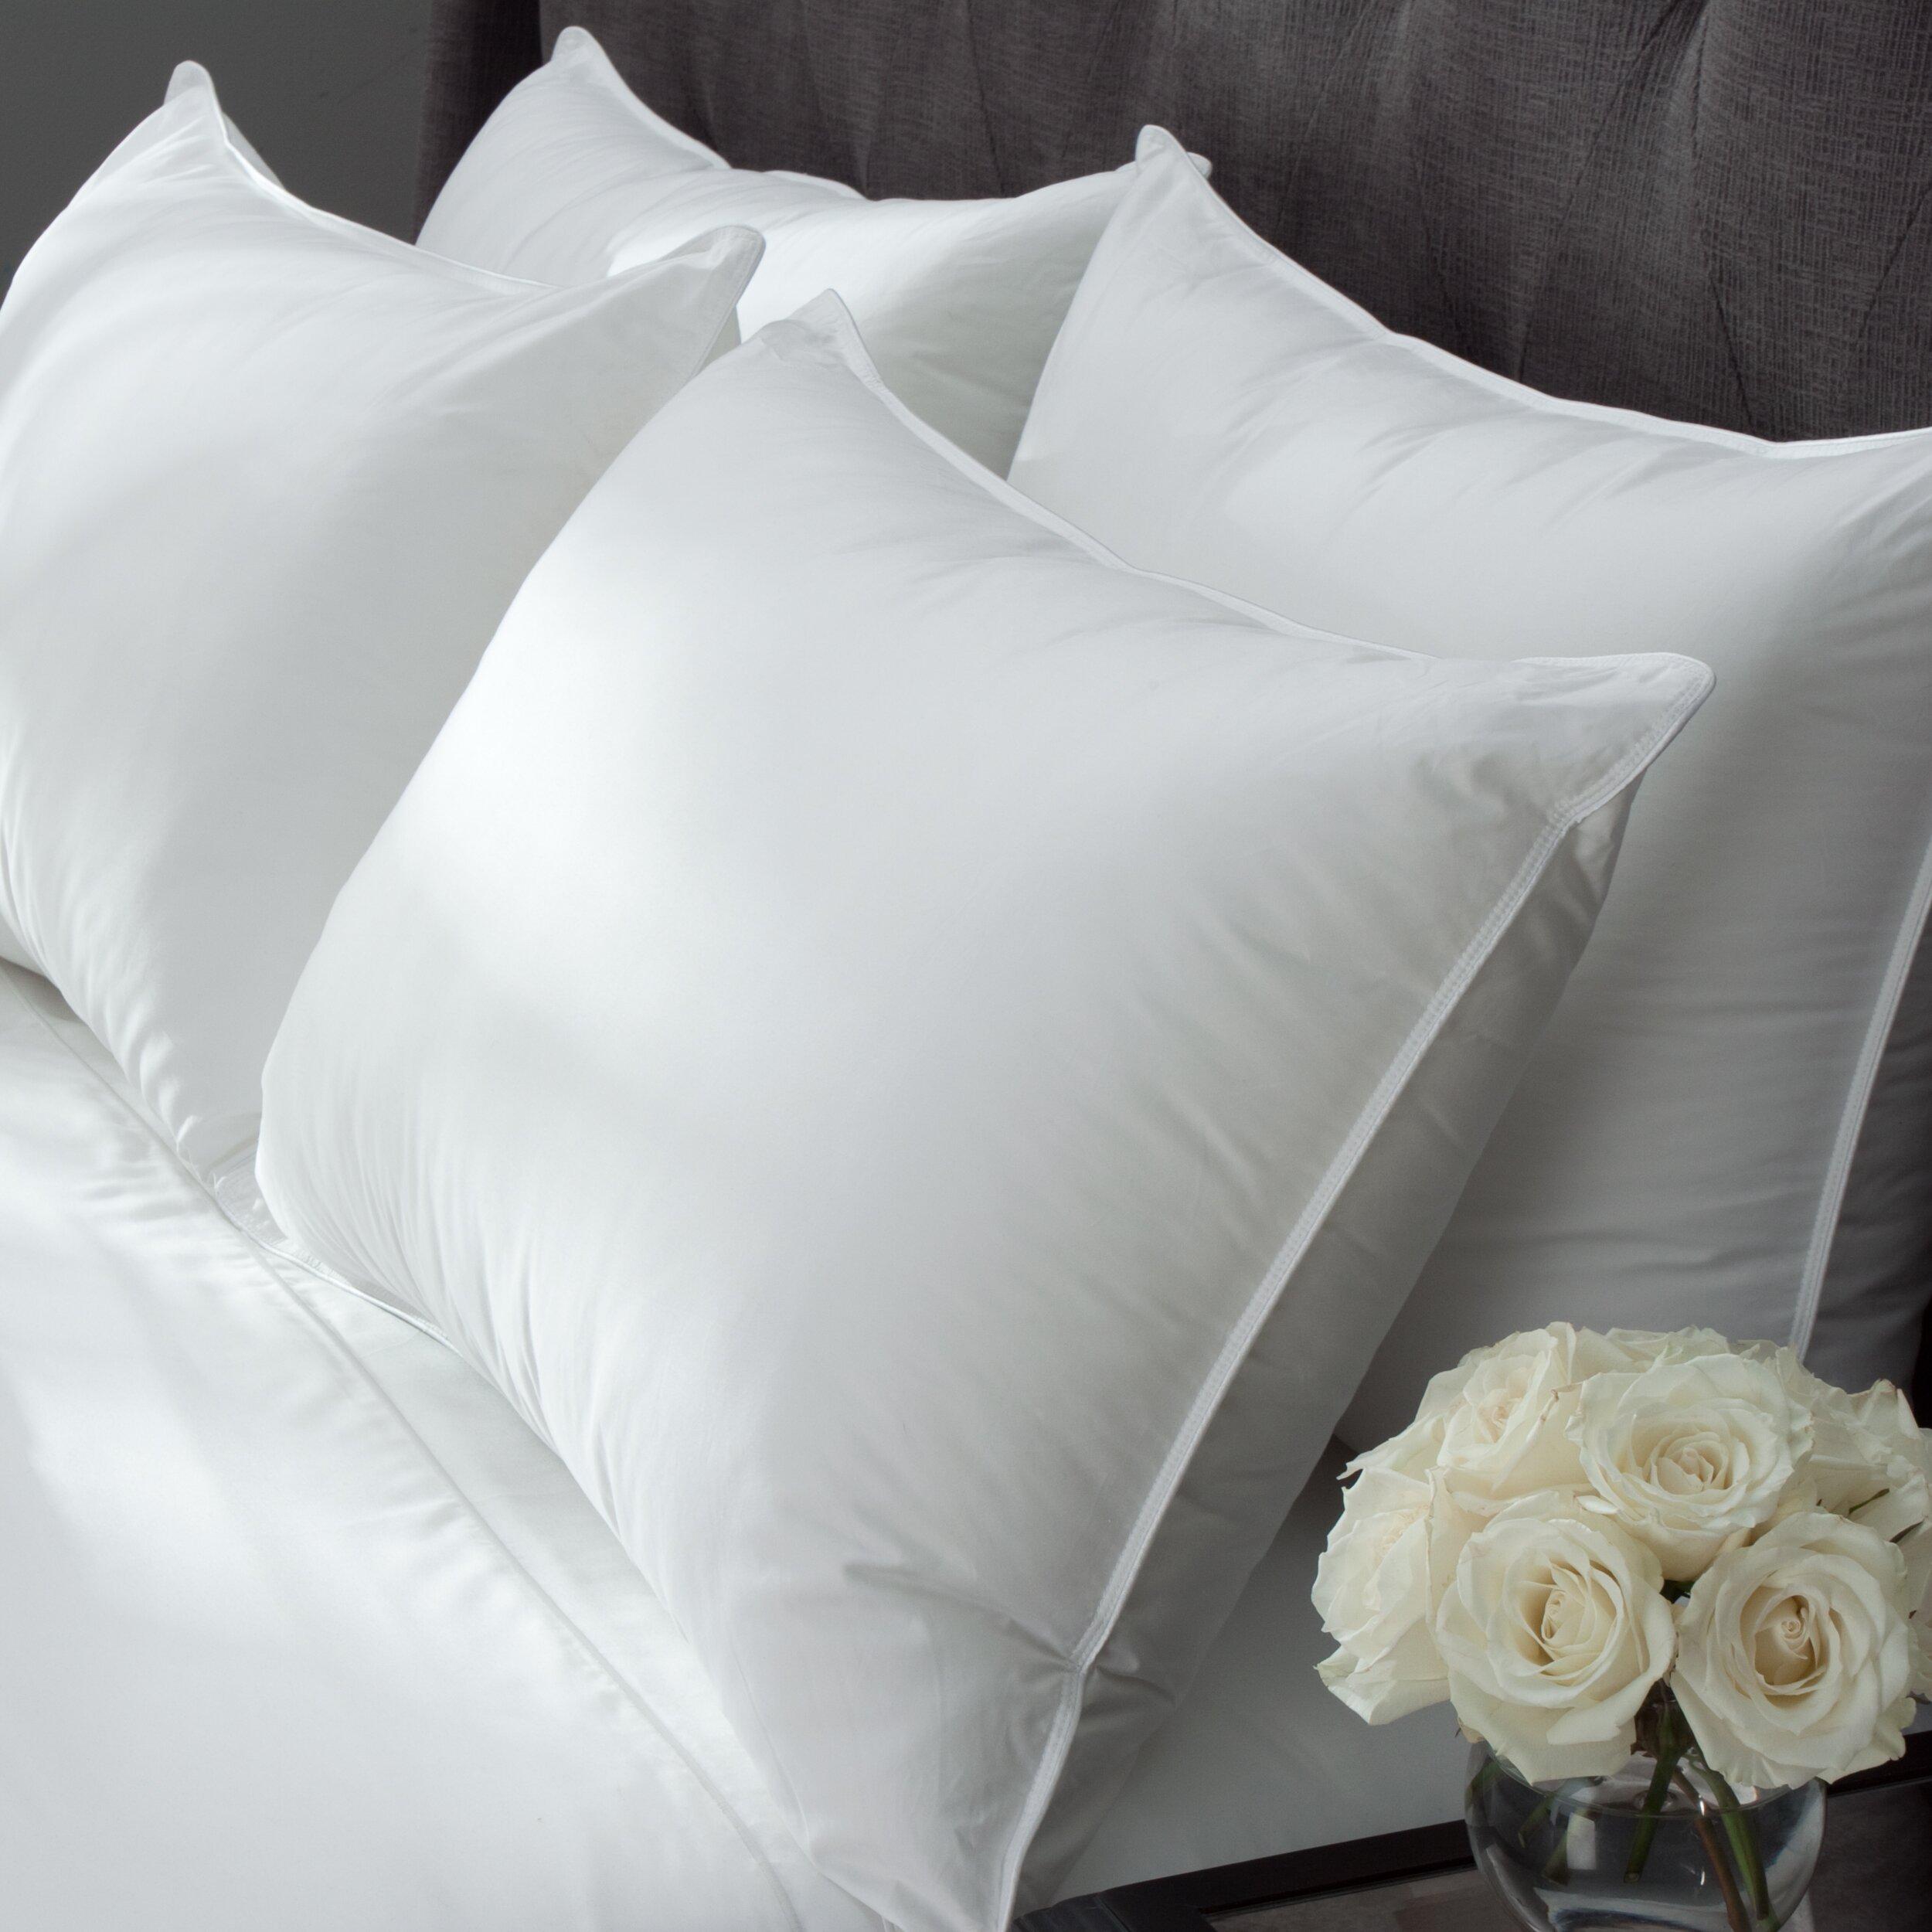 Sealy EnviroLoft Hypoallergenic Down Alternative Pillow & Reviews Wayfair